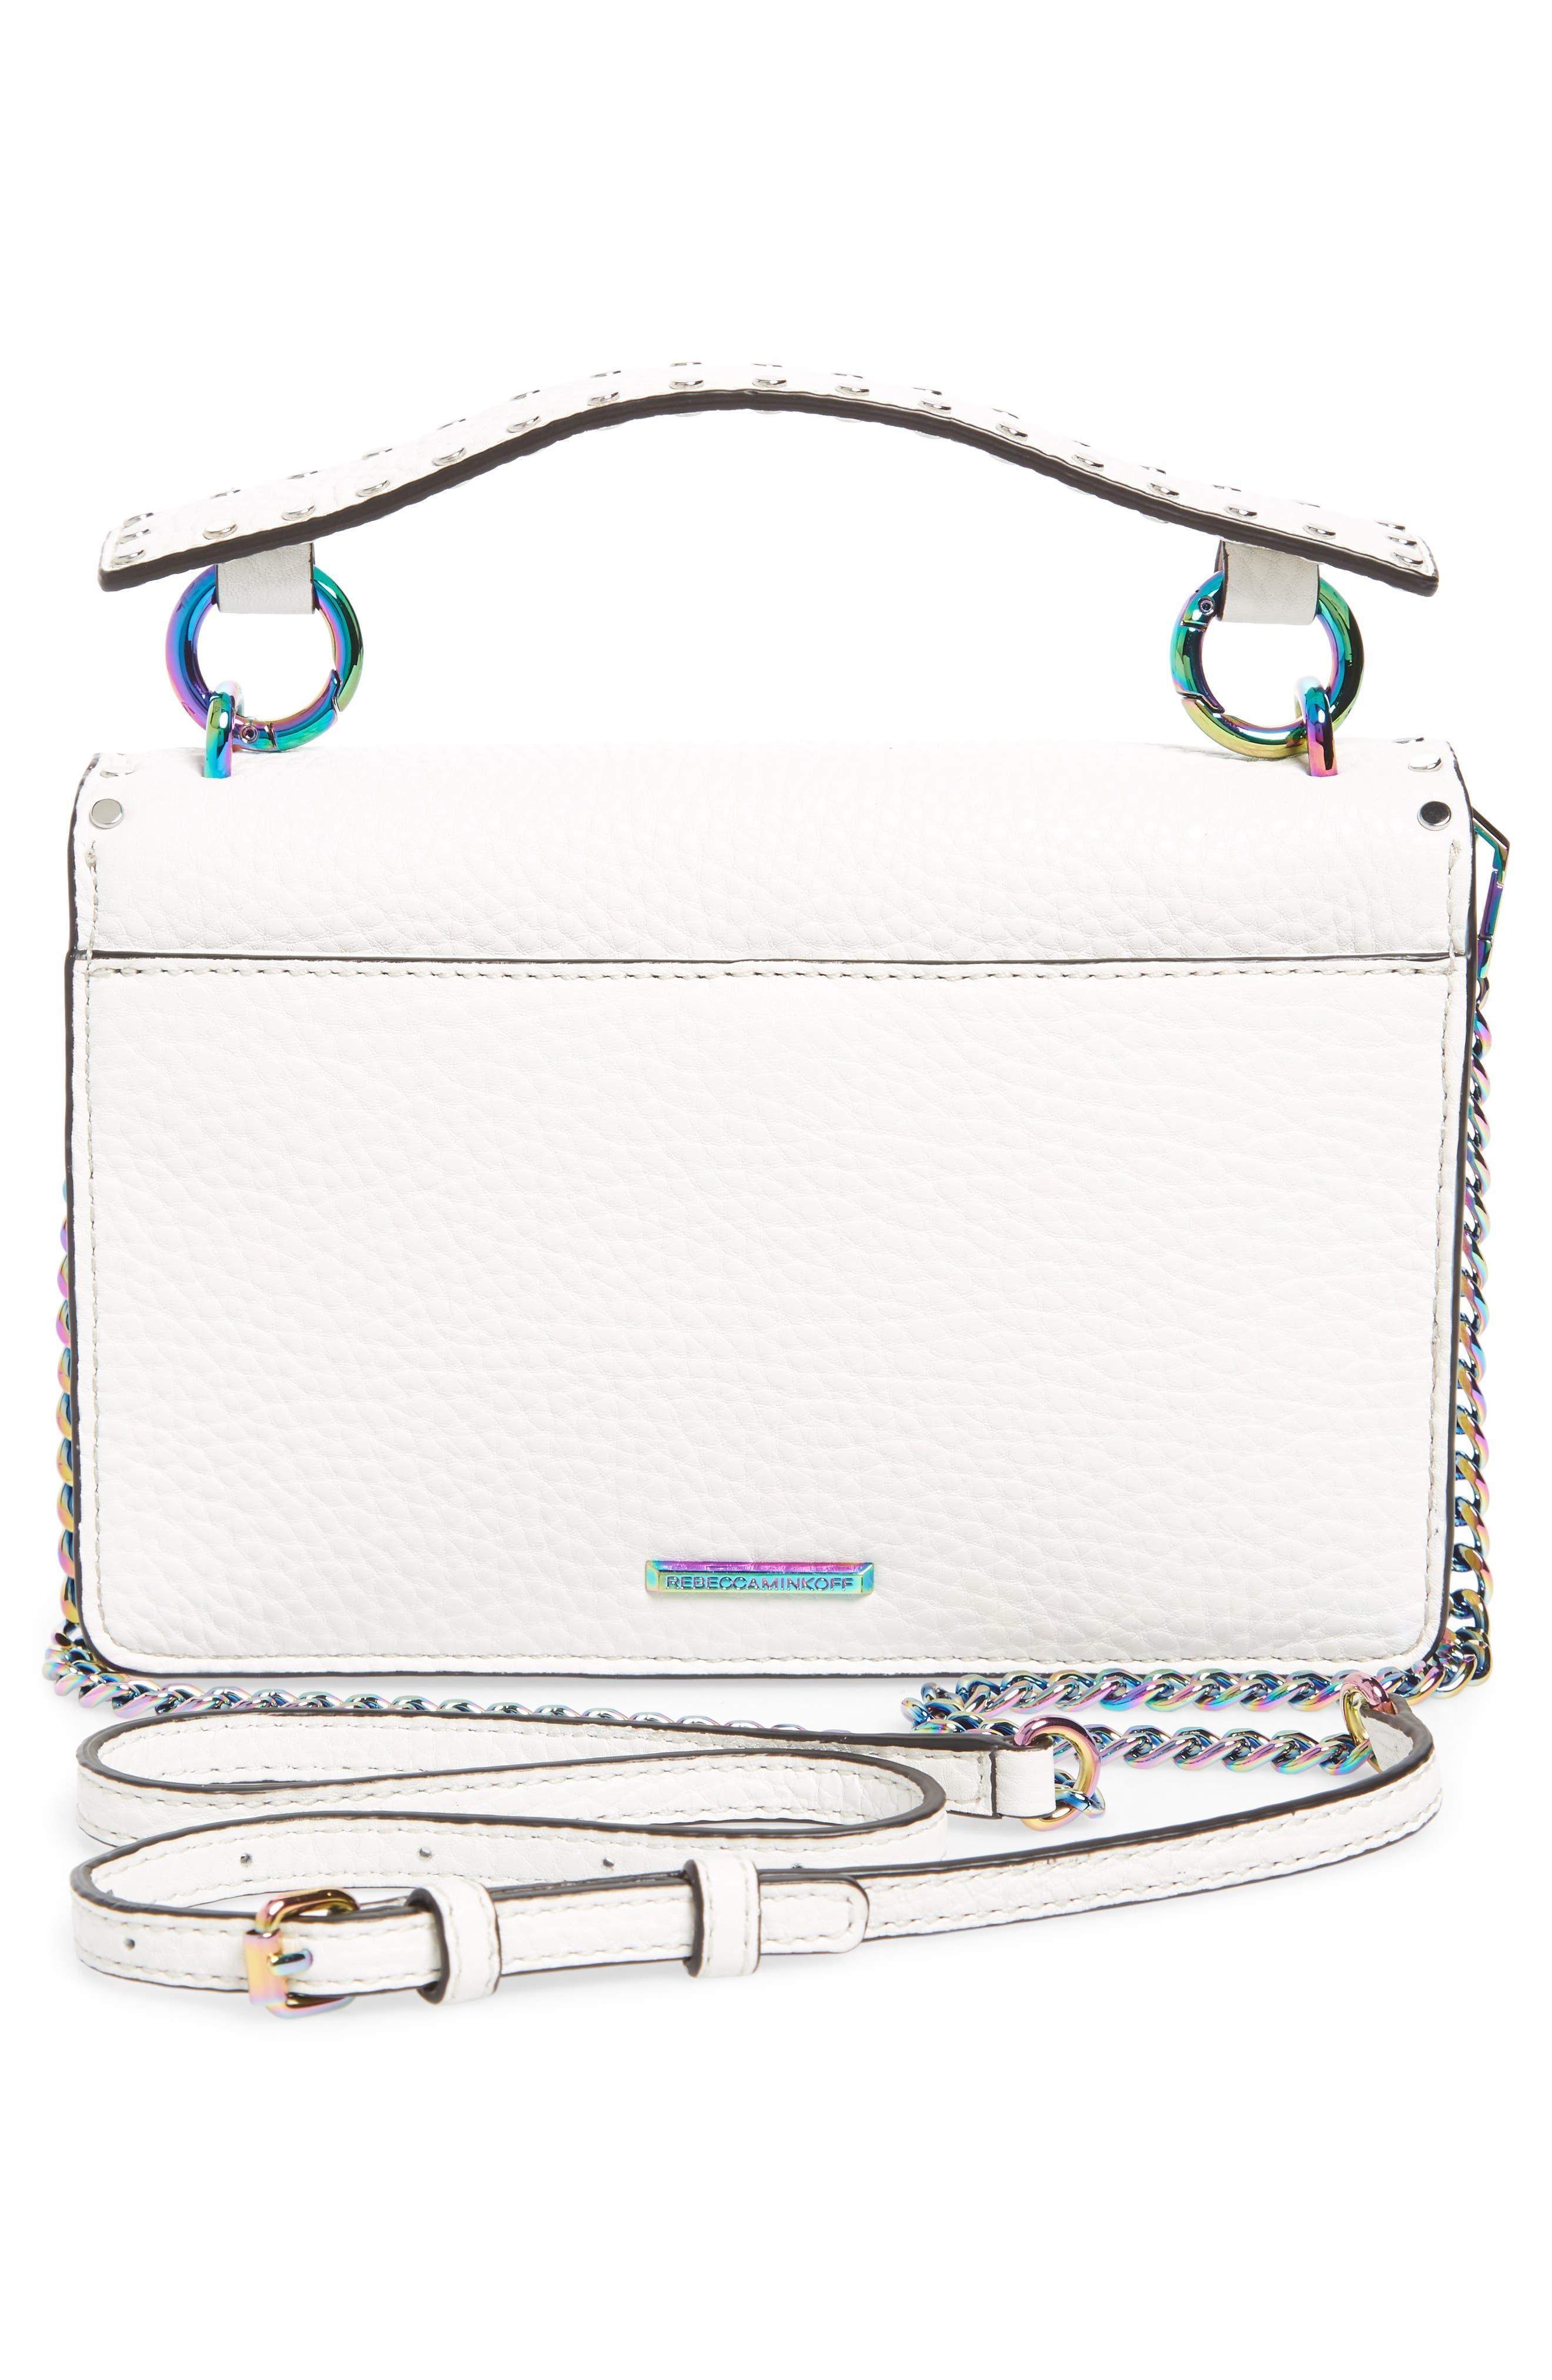 Darren Leather Top Handle Crossbody Bag,                             Alternate thumbnail 3, color,                             151